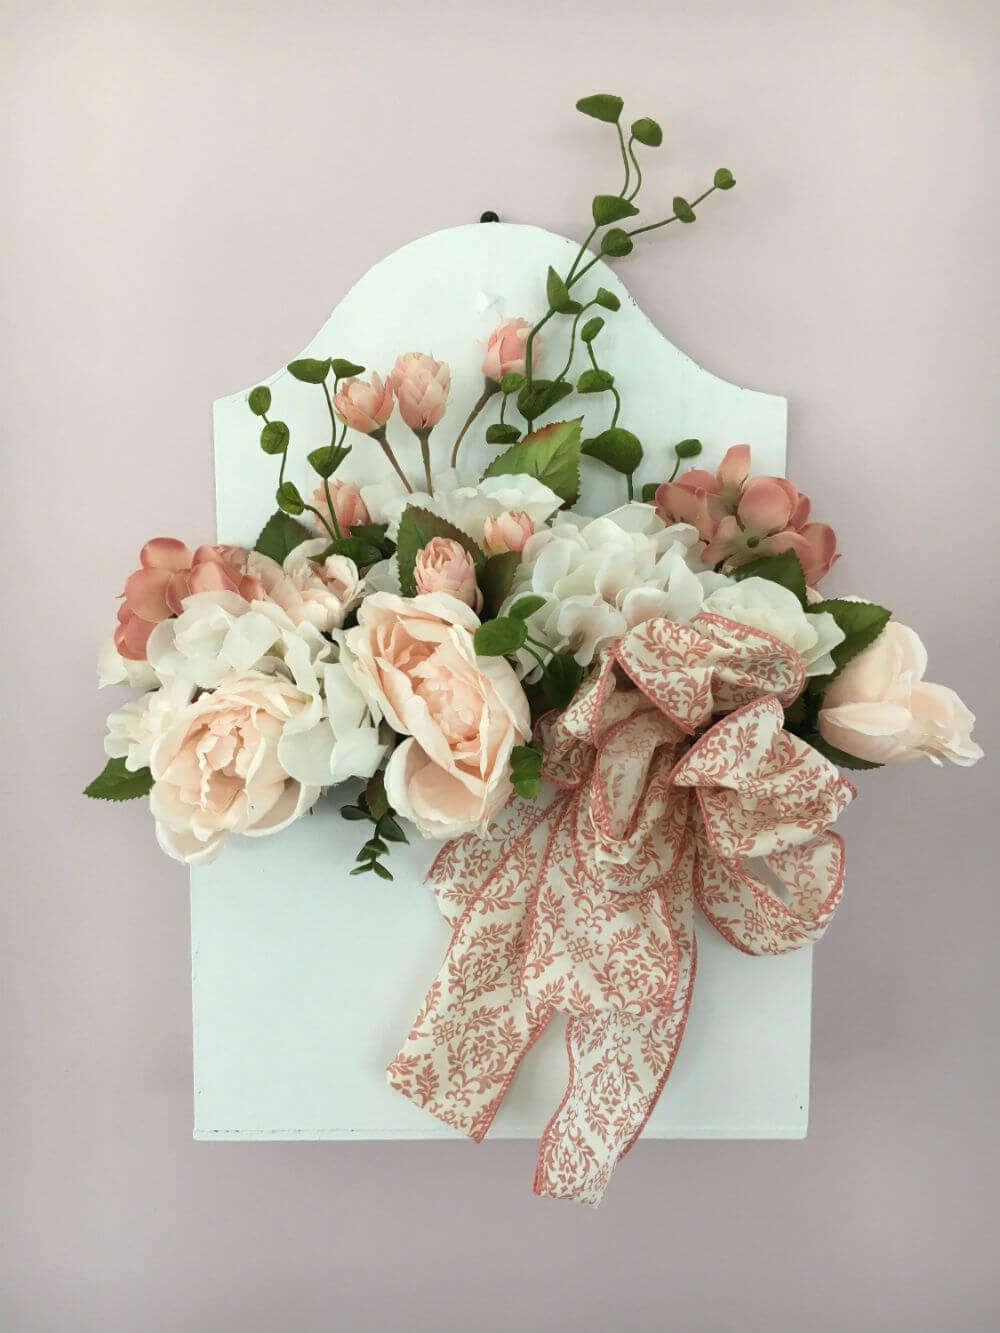 A Delicate Silk Flower Farmhouse Box